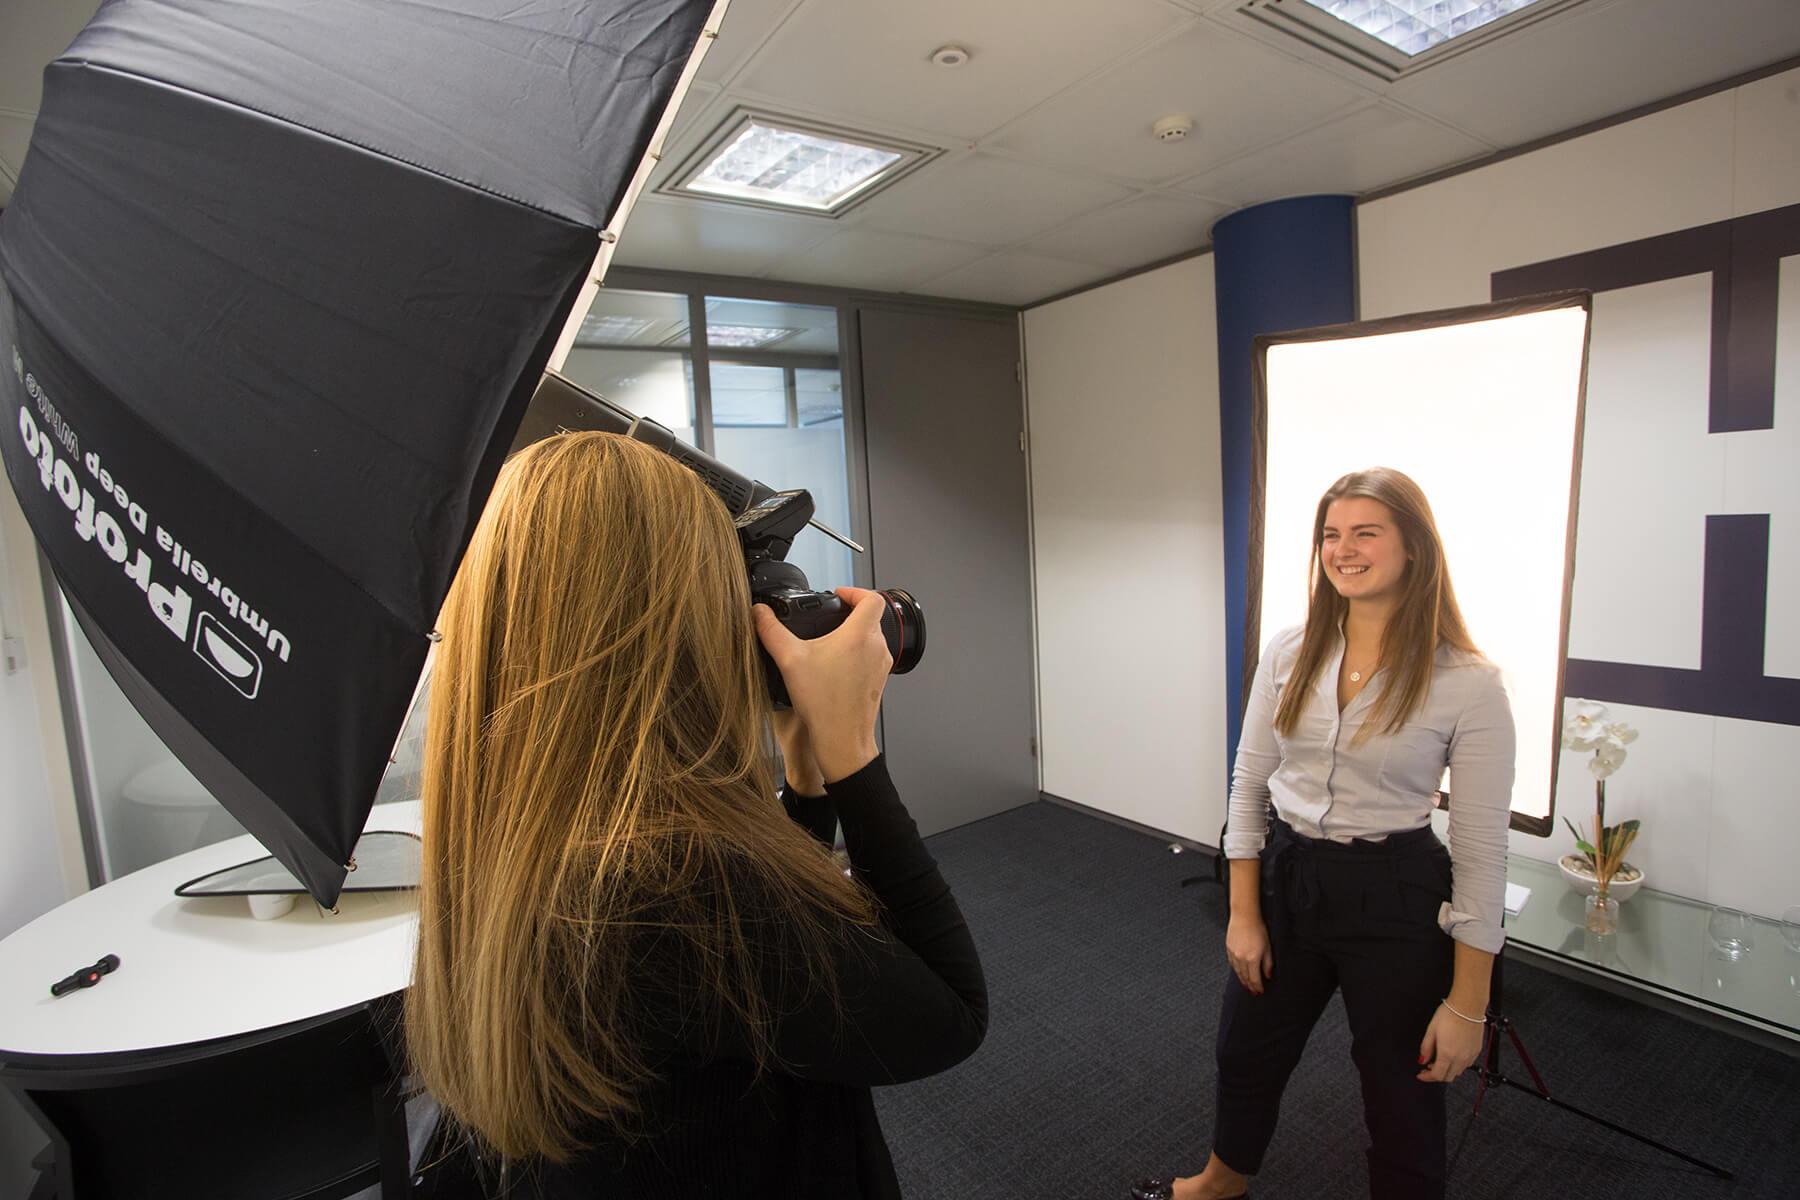 Hannah Couzens photographs a subject for Profoto Academy